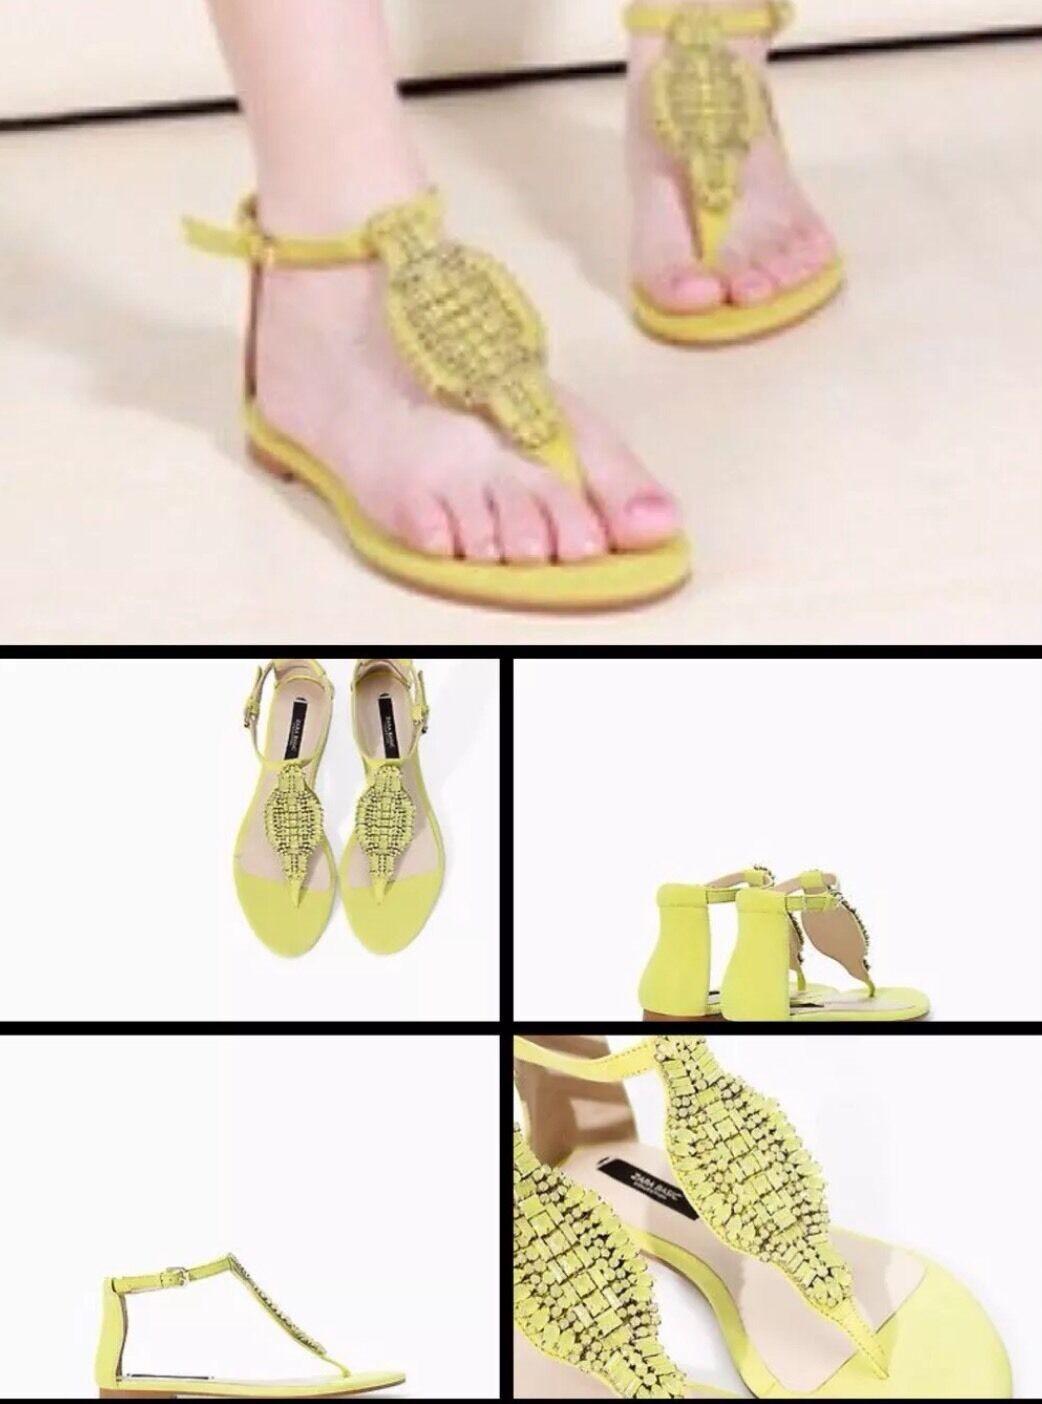 Zara Neon Giallo Lime Verde Sandali GIOIELLO Impreziosito pendente EURO 38